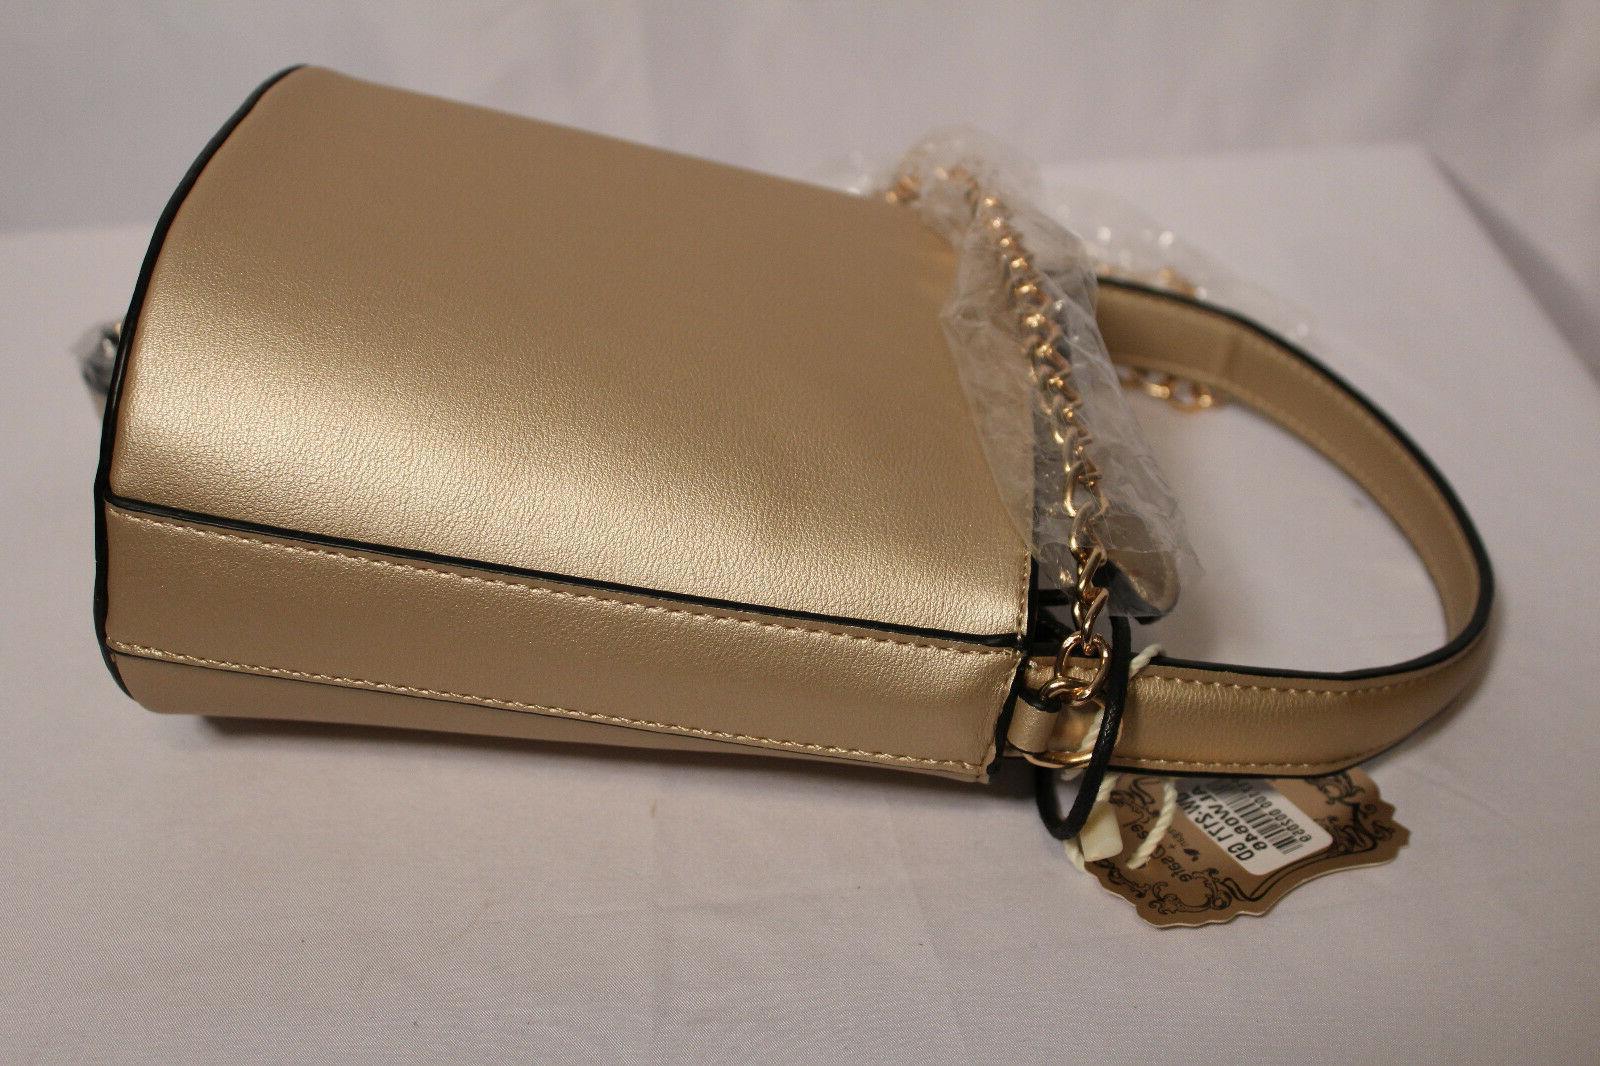 Alyssa NWT Gold Bucket/Crossbody Bag Vegan and Safe Bag